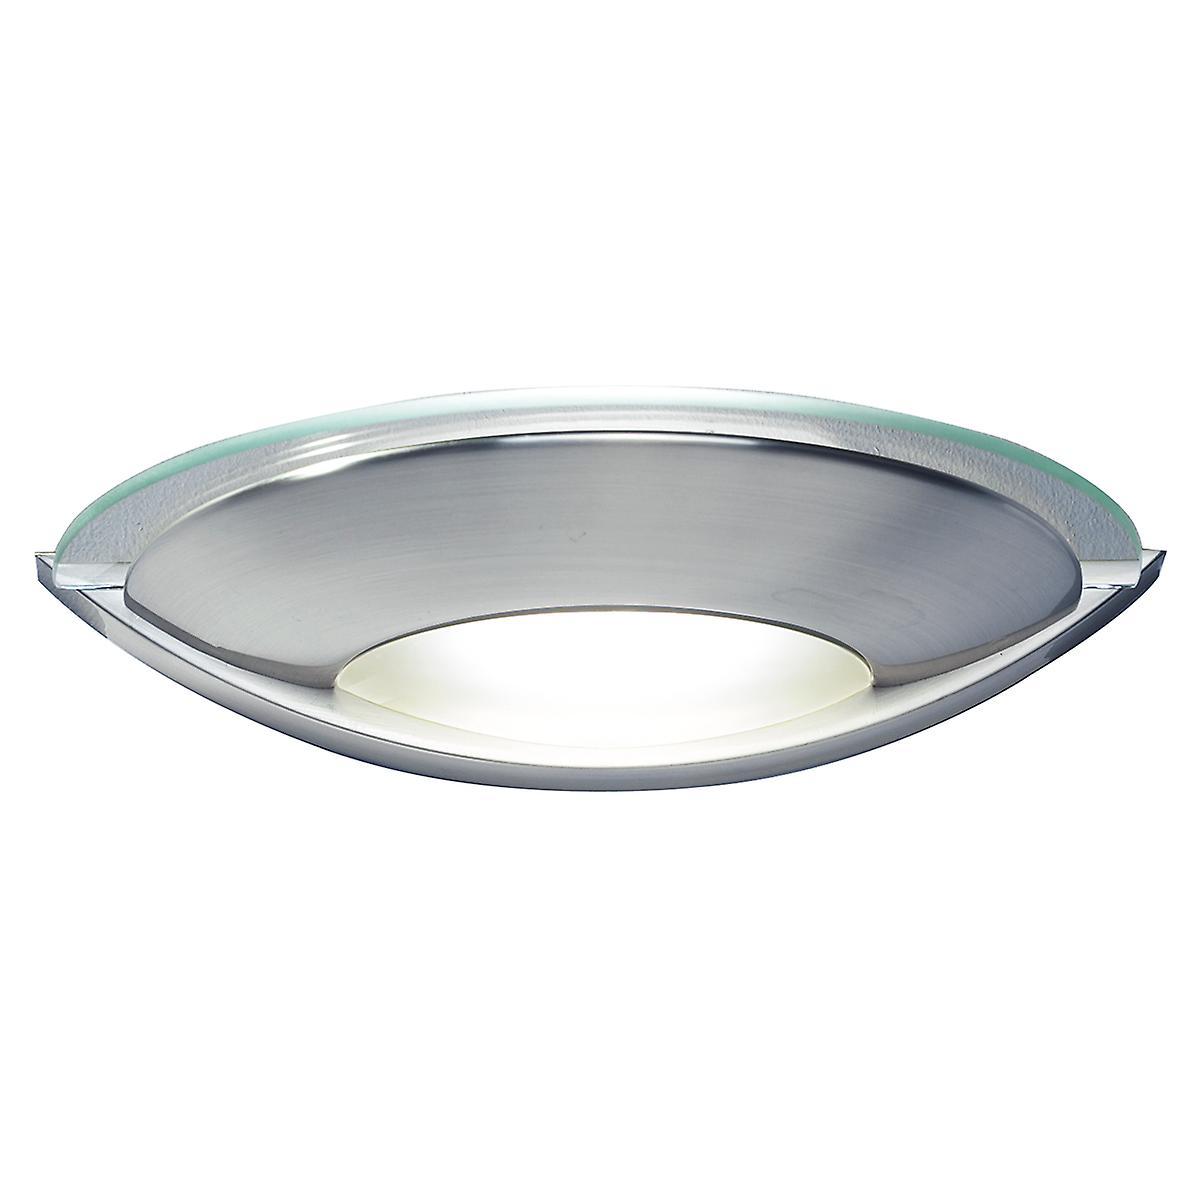 Dar VIA0746 Via Modern Single Wall Light With A Satin Chrome Finish